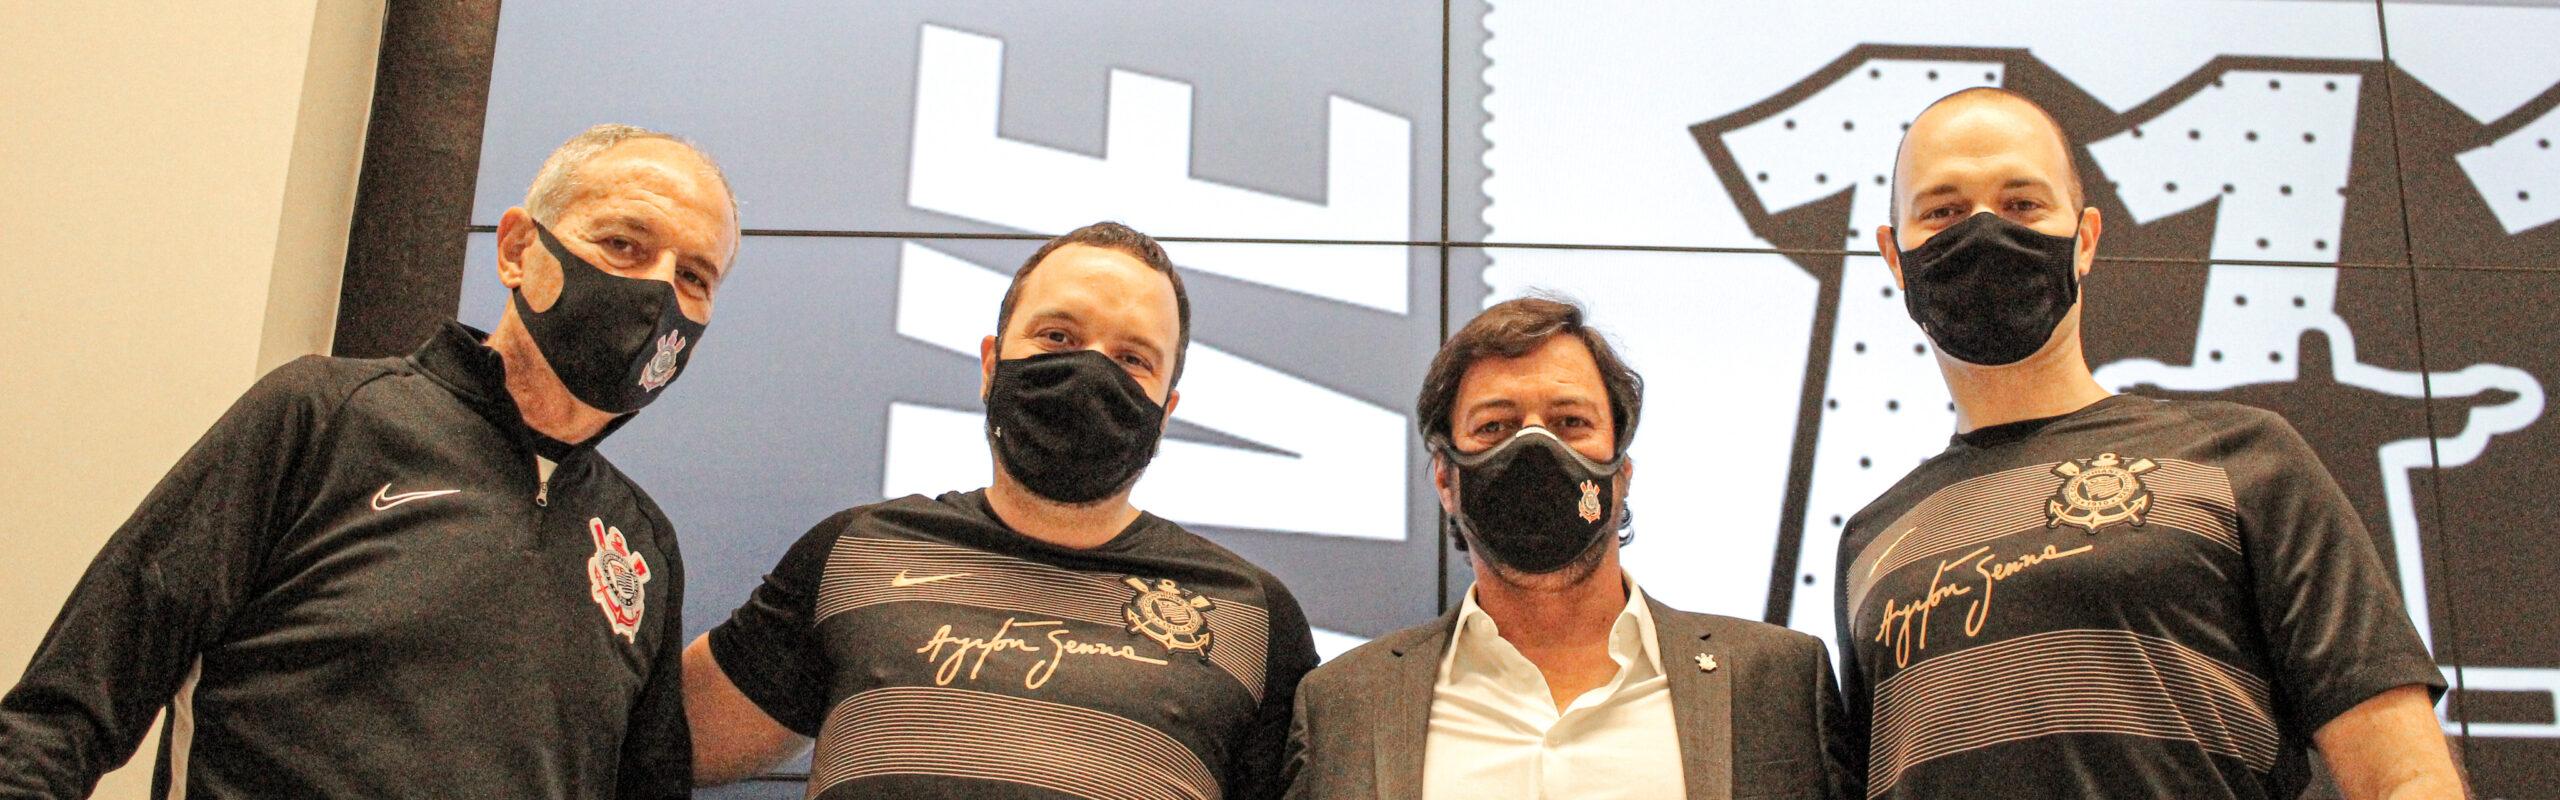 Corinthians e Mercado Bitcoin fecham patrocínio até fim de 2022